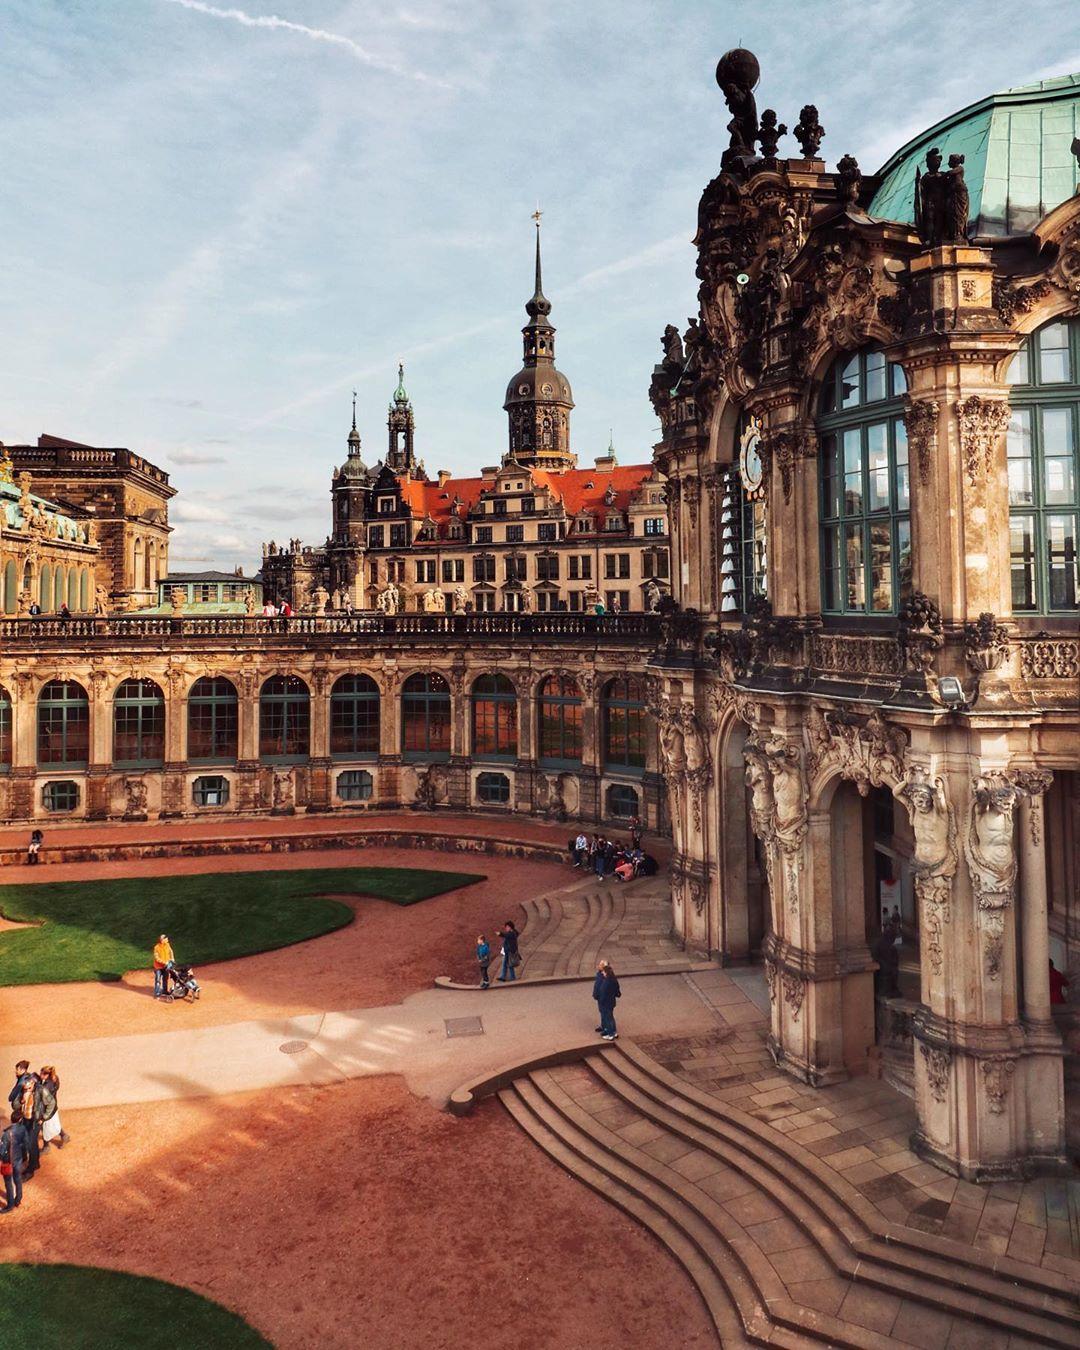 Sunny Dresden Yesterday The Zwinger At 1 30pm Castle Plans Instagram Deutschland